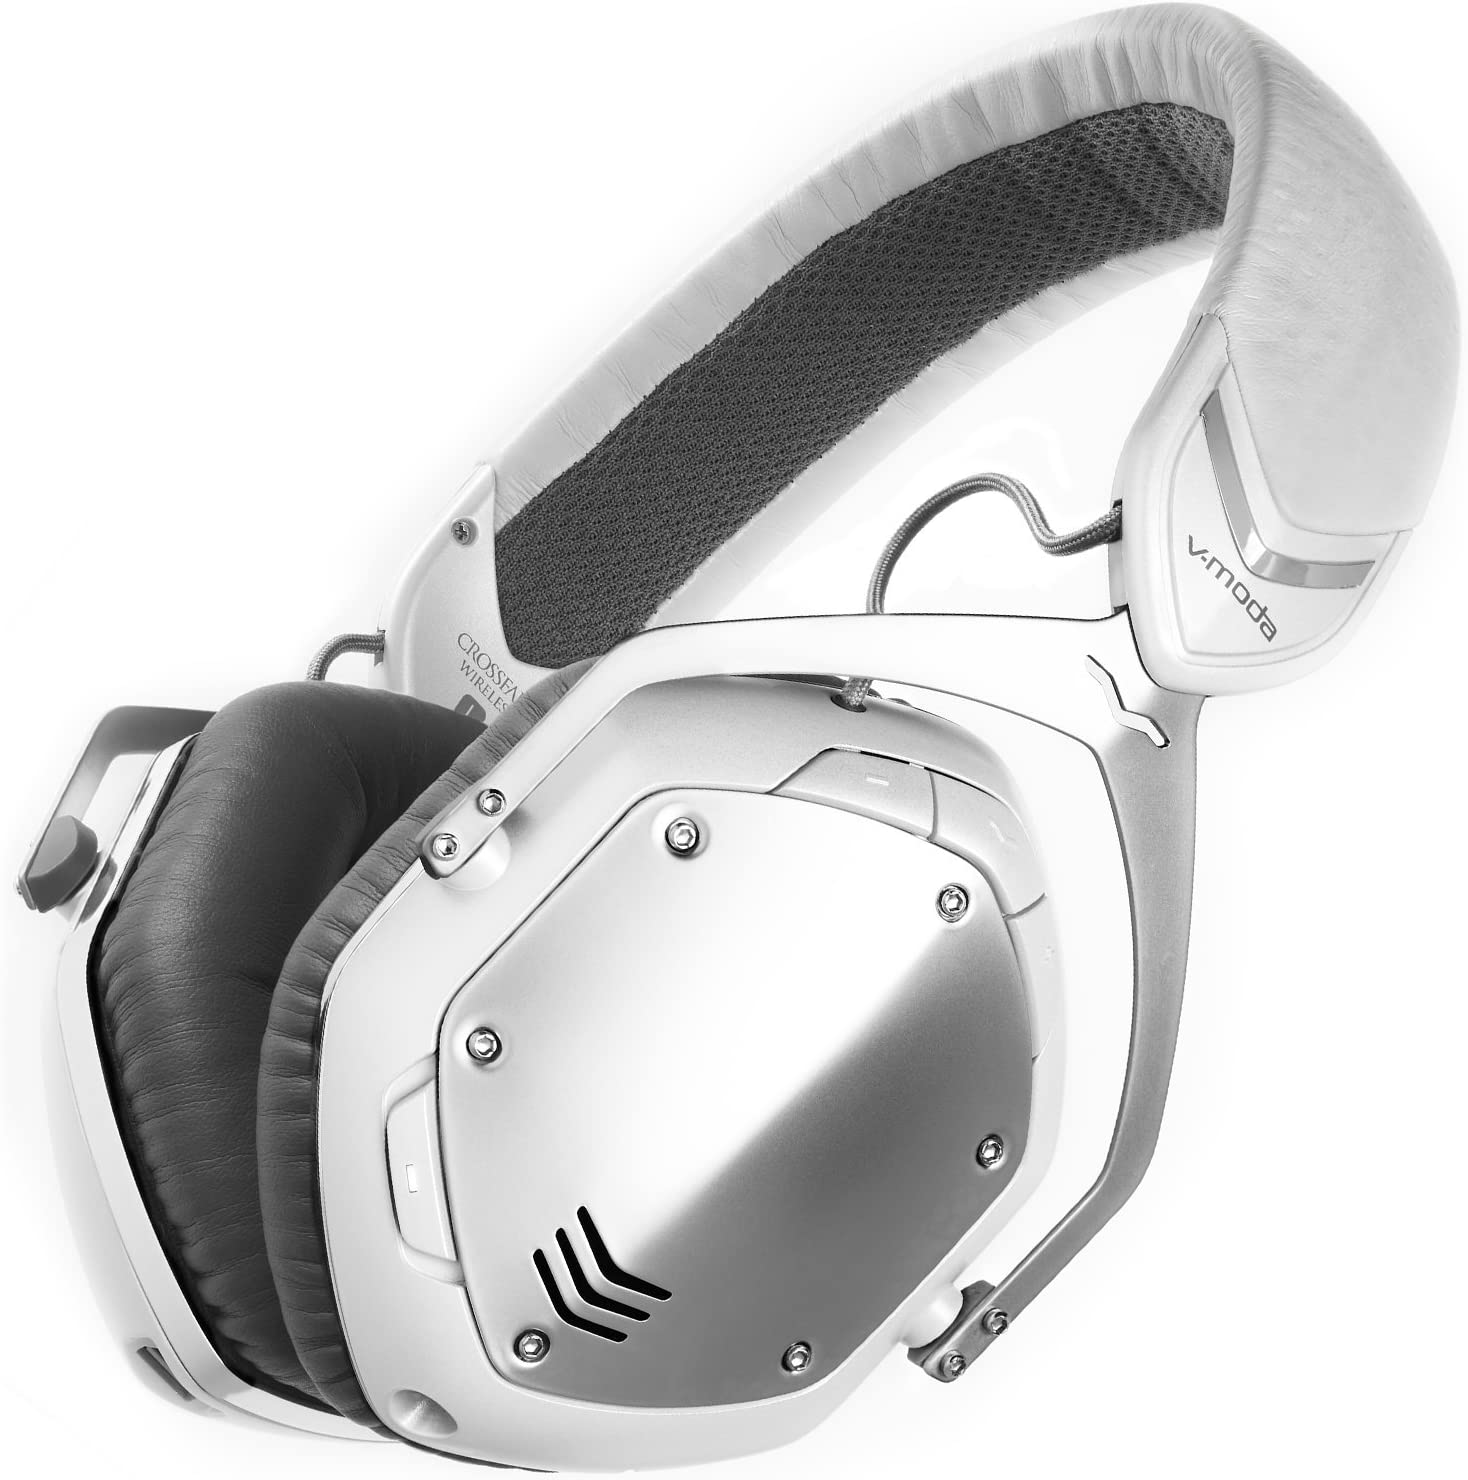 V-MODA Crossfade Wireless Over-Ear Headphone, White Silver